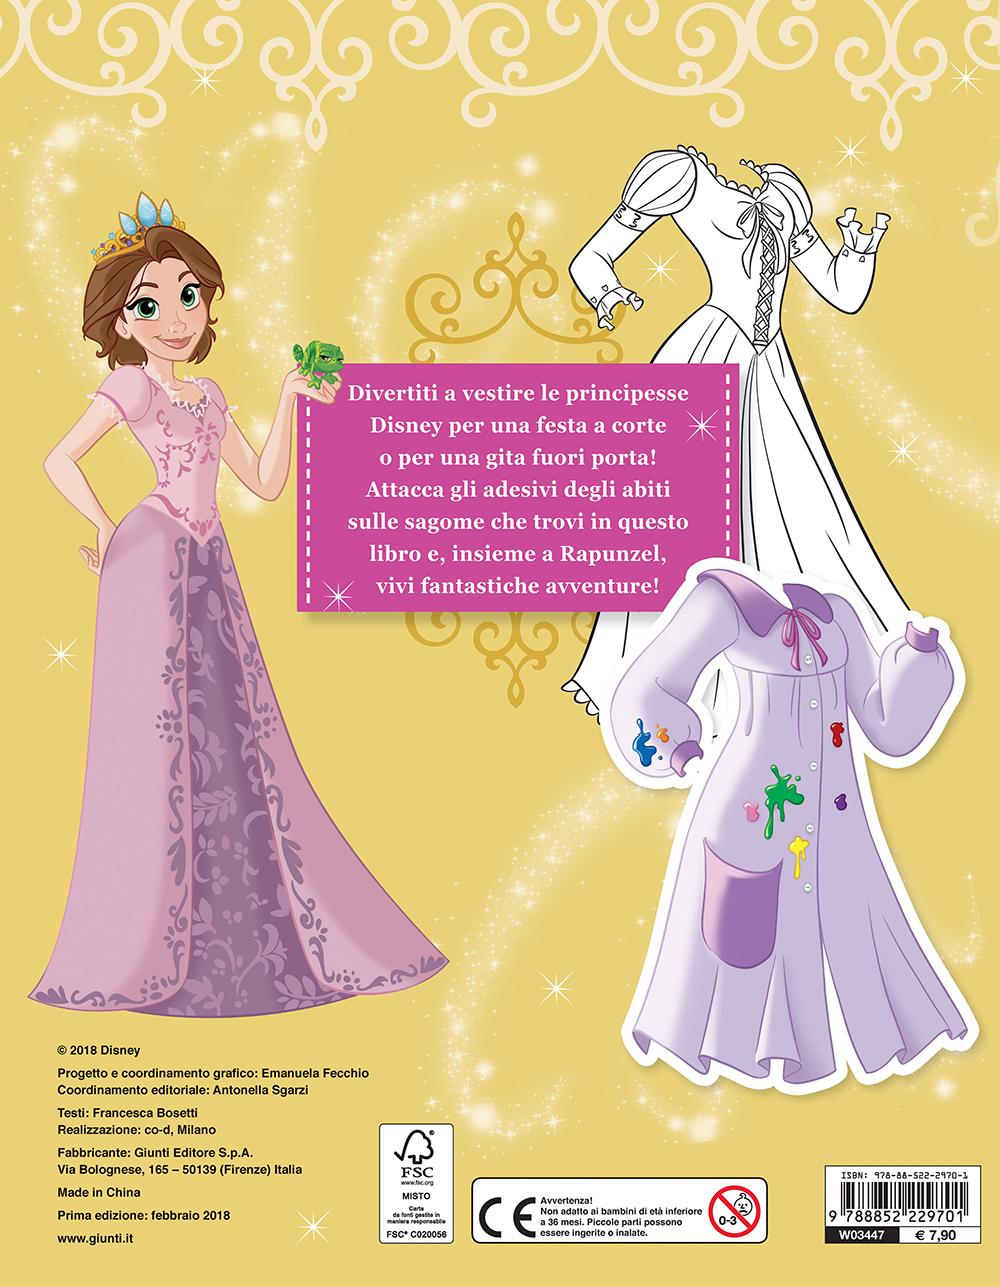 Gioca con la moda - Principesse. Rapunzel